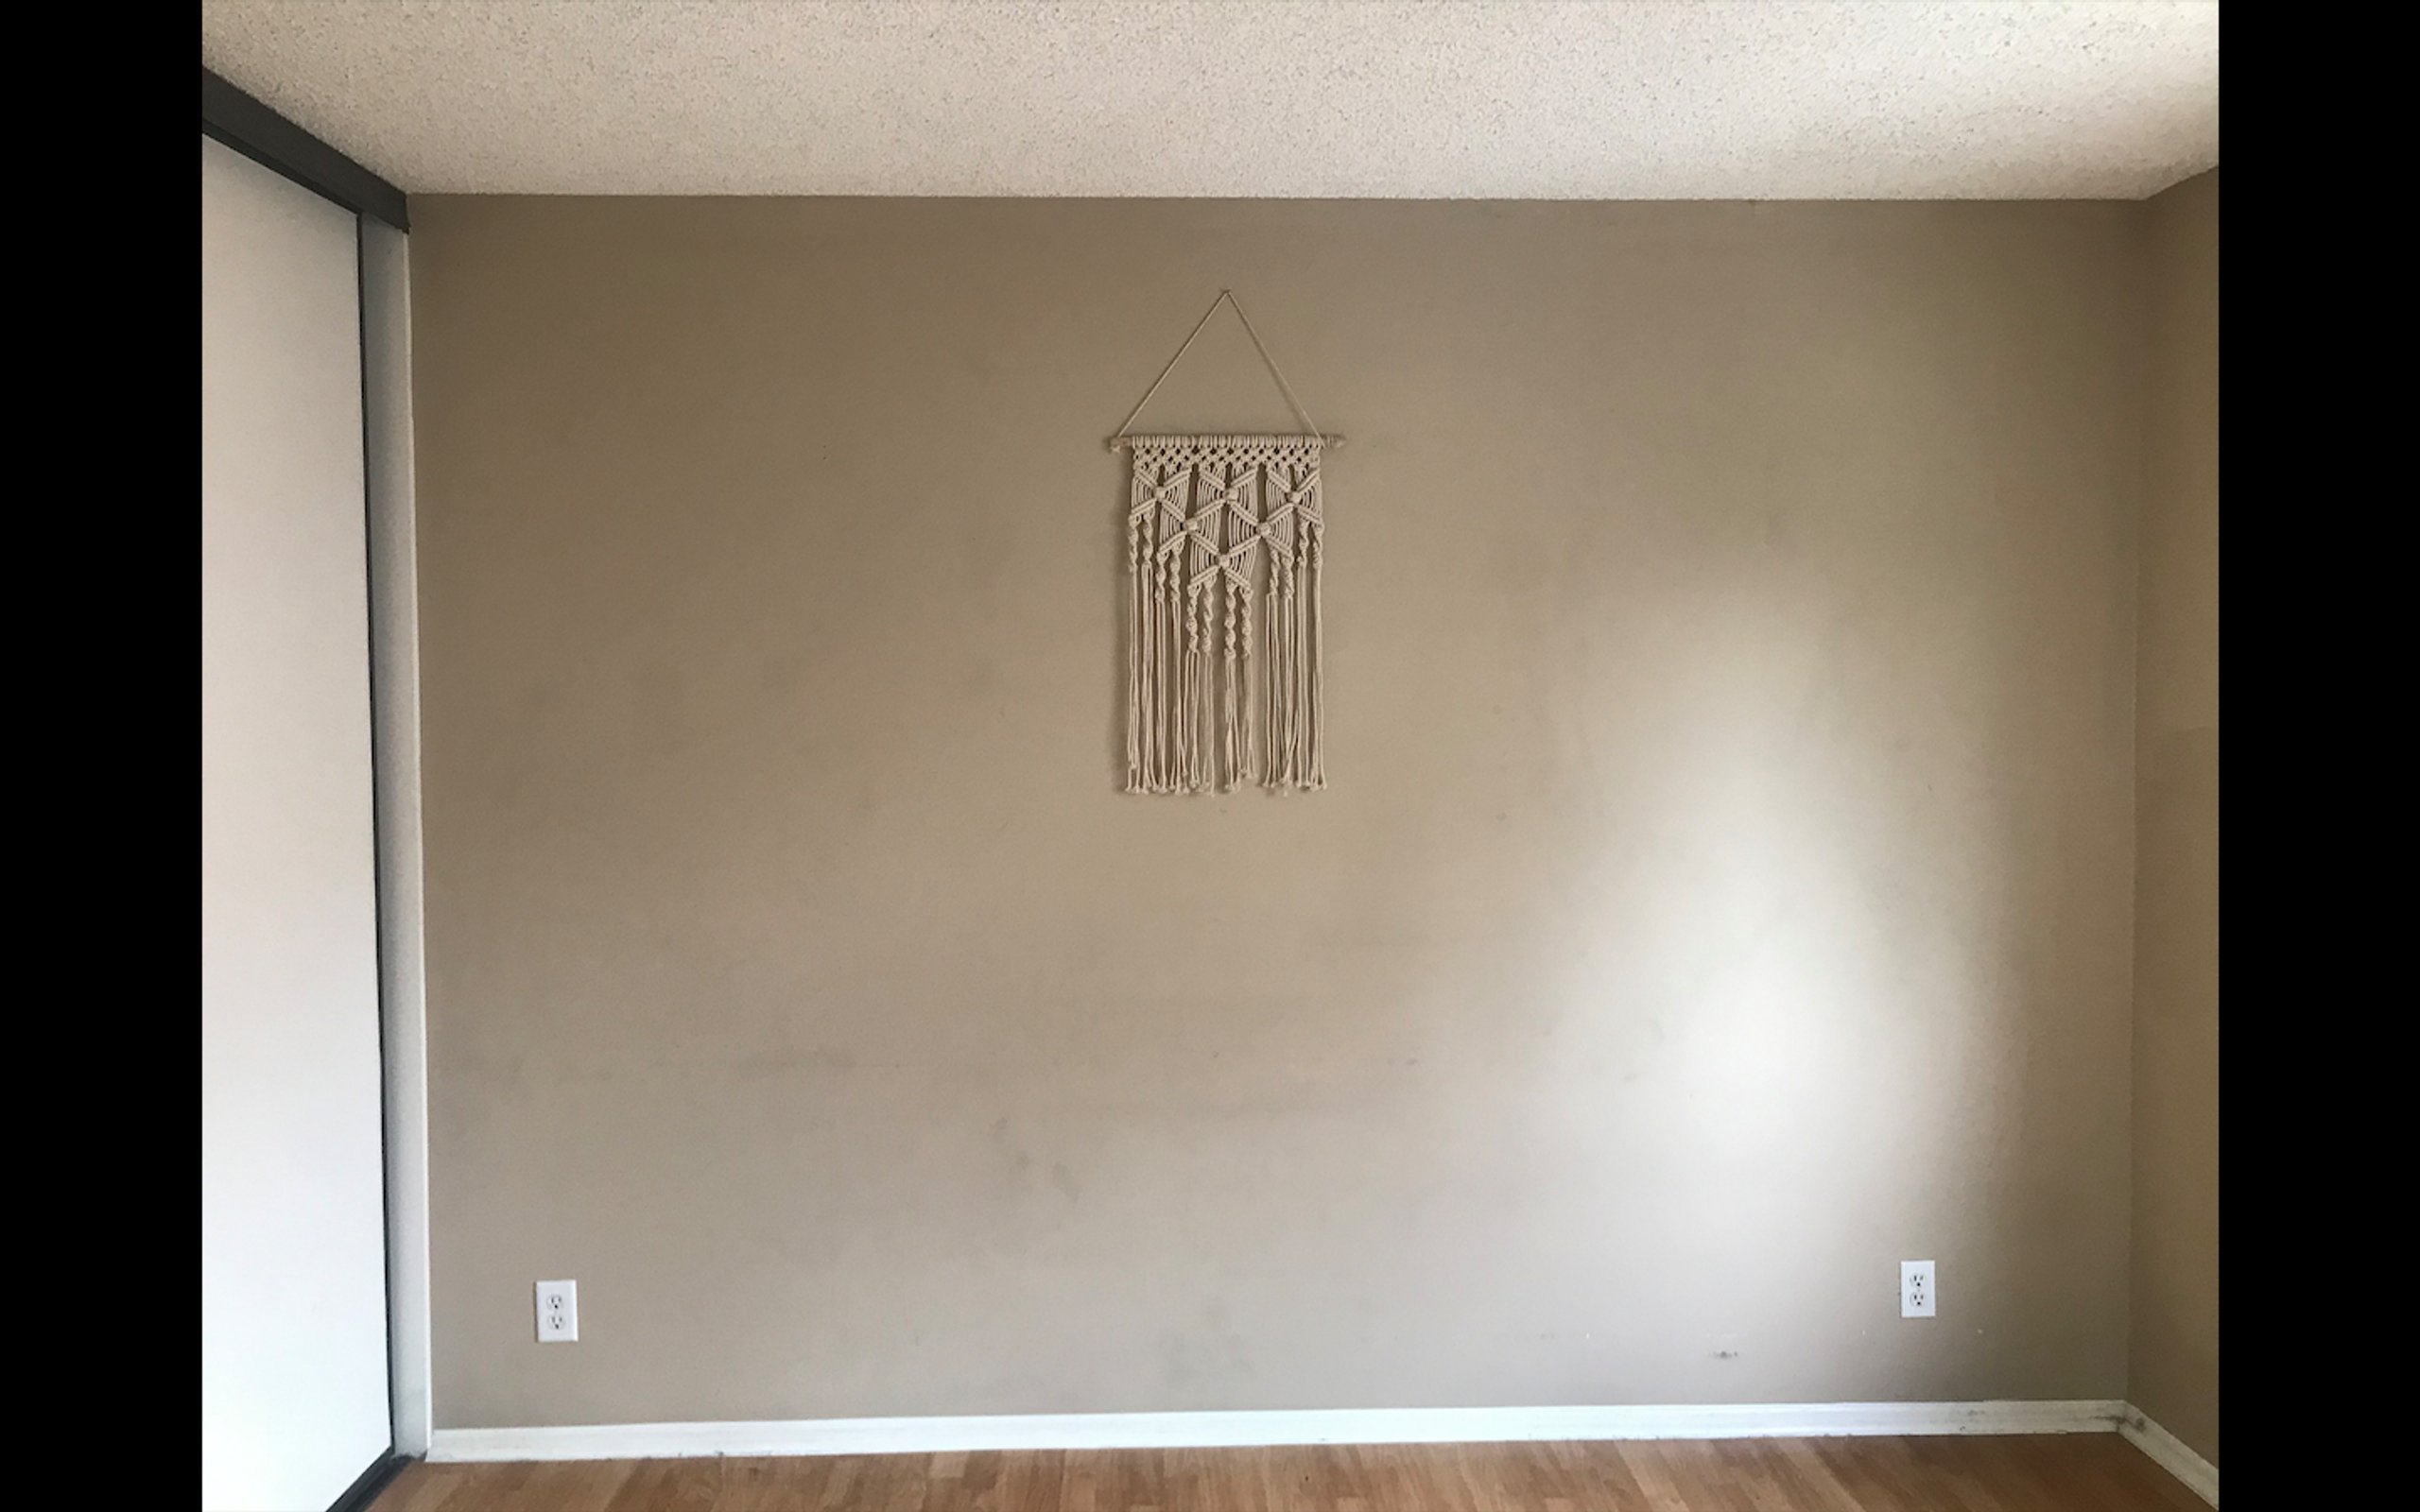 14x13 Bedroom self storage unit